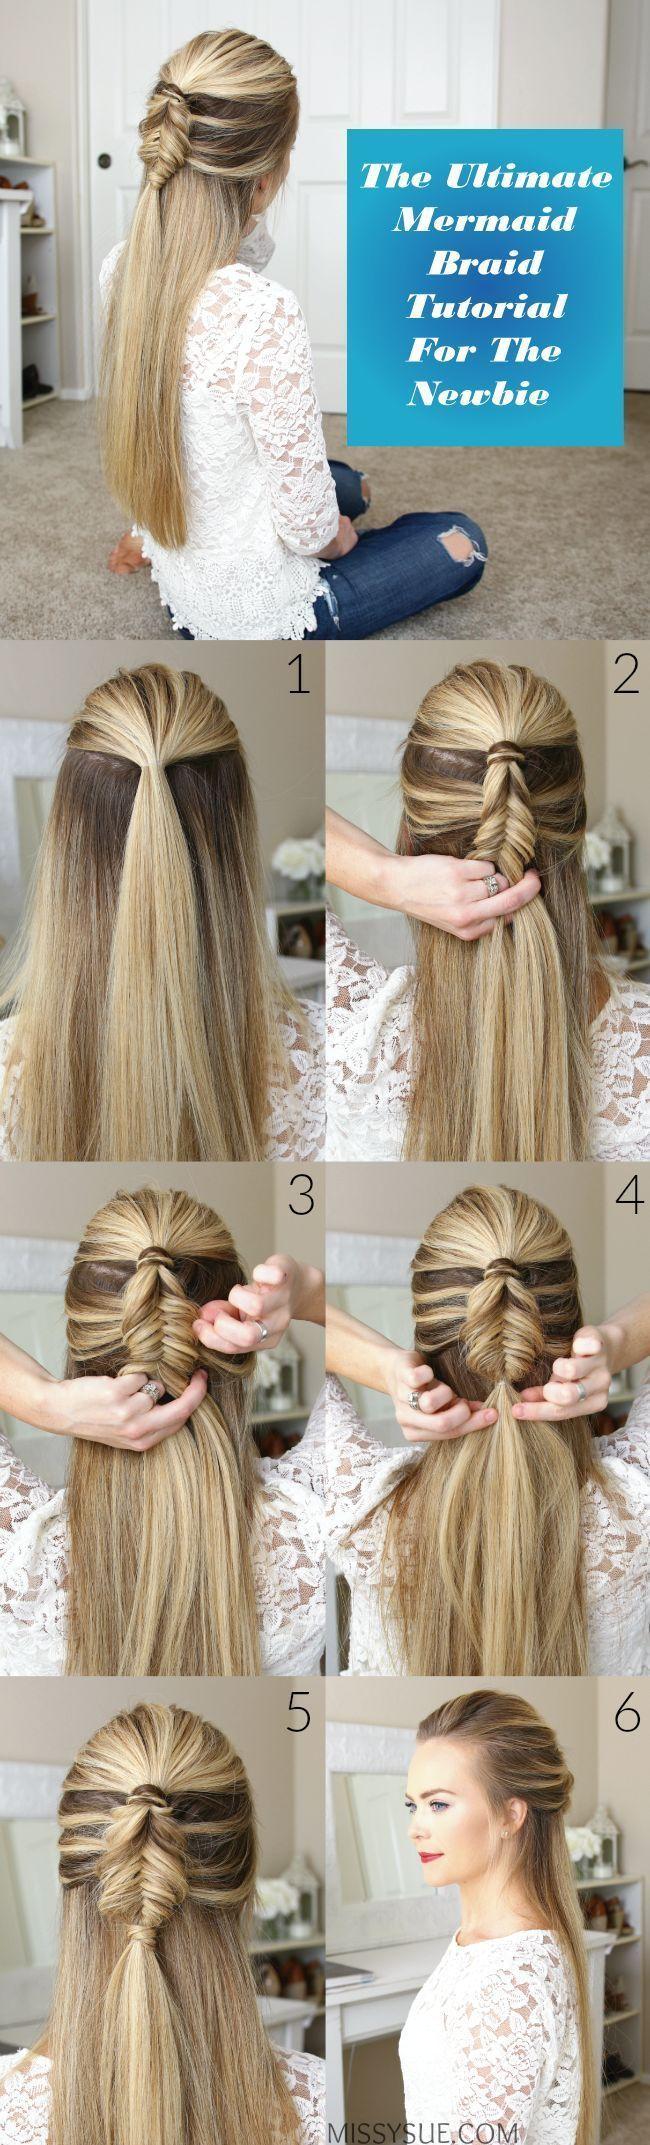 The 25+ best Braiding your own hair ideas on Pinterest | Braids ...